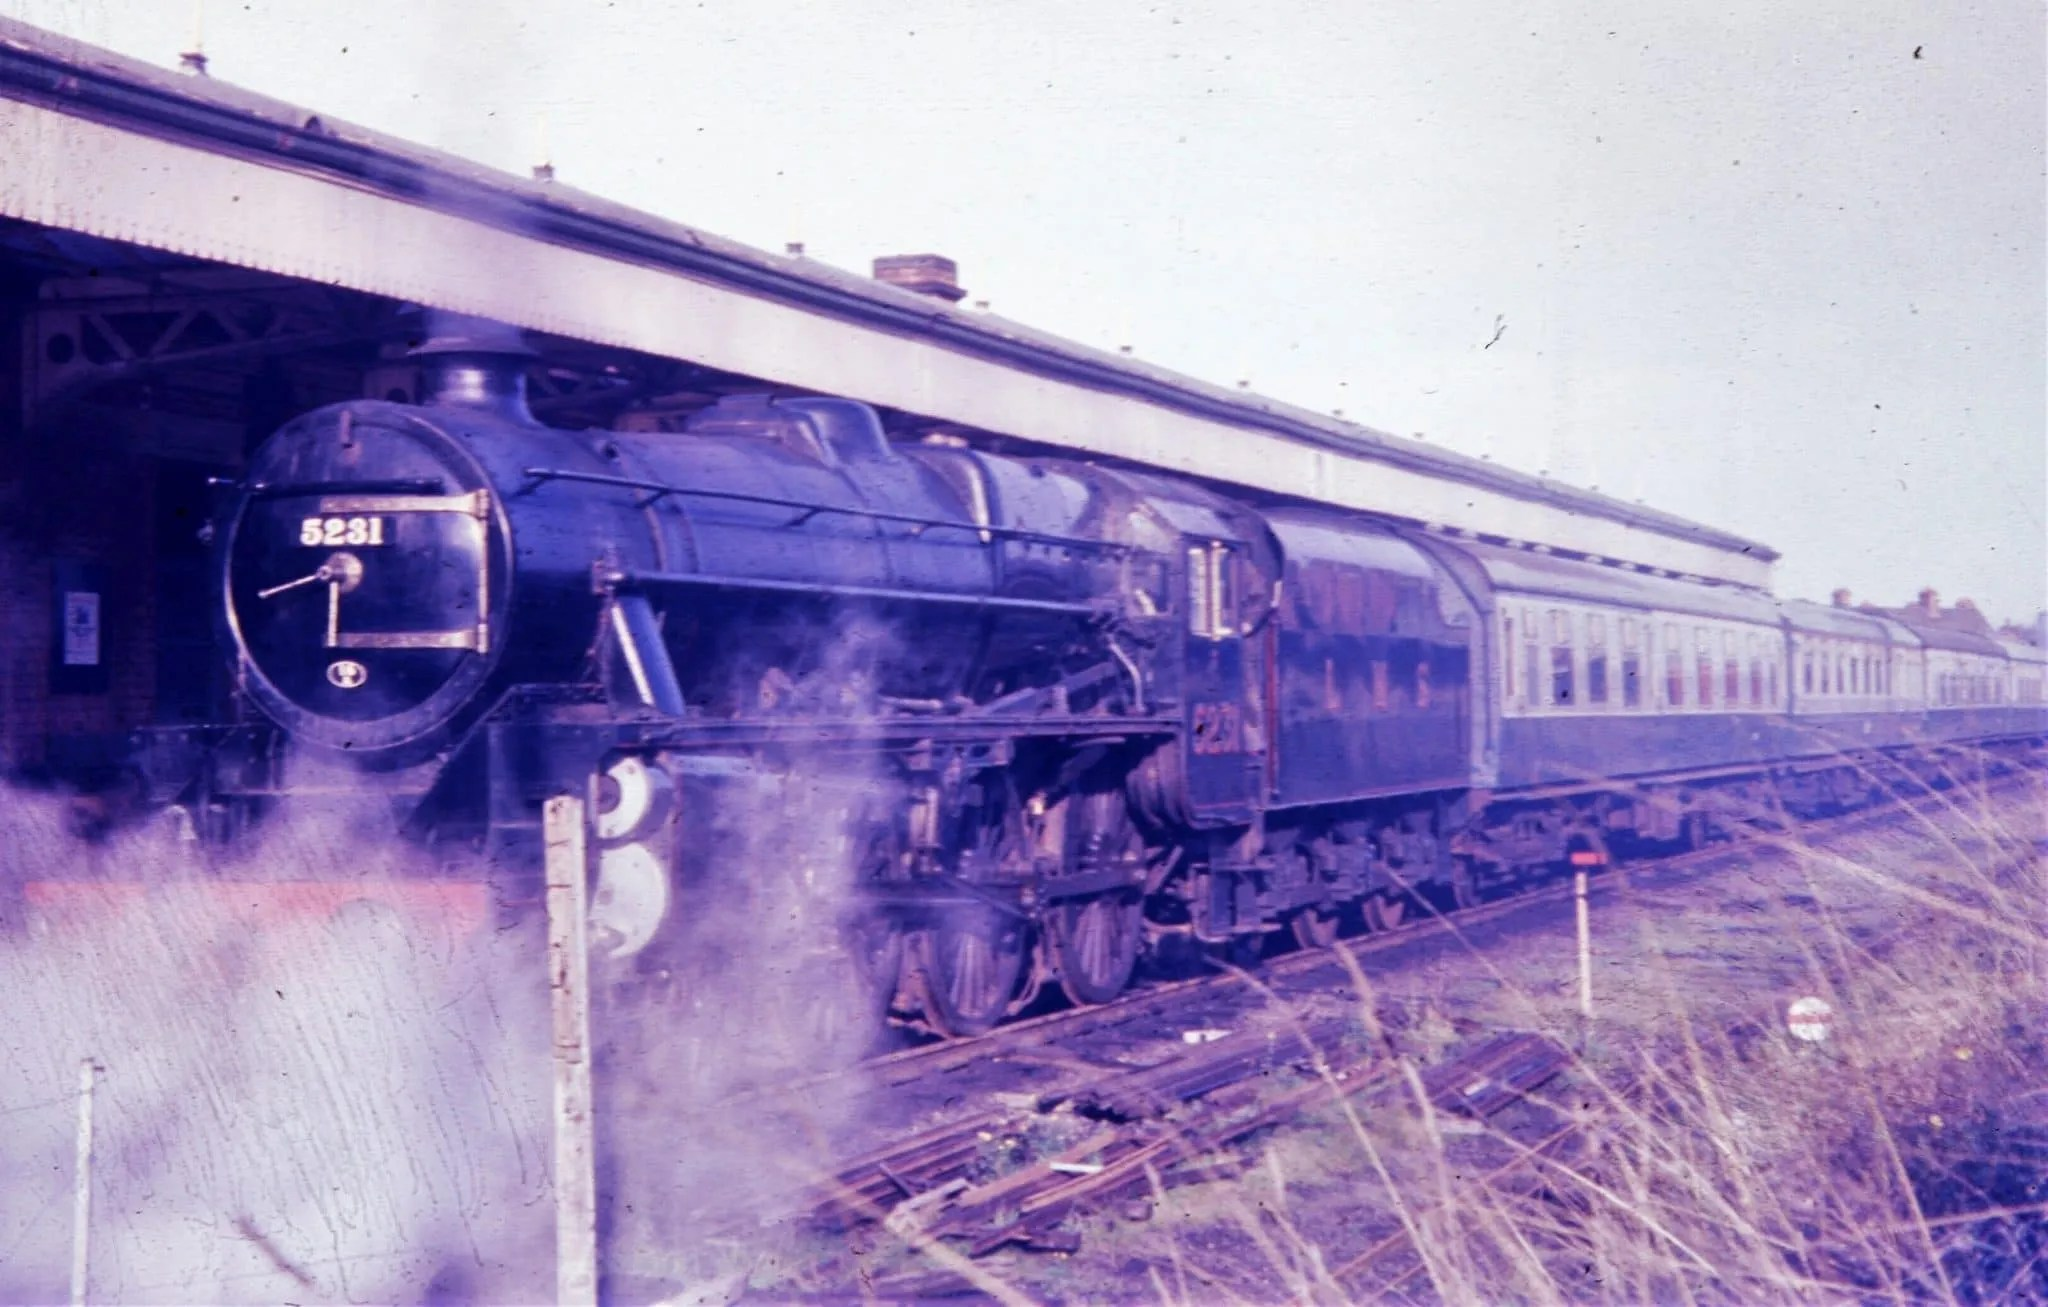 Stanier Black Five 5231 - steam locomotive - at Loughborough Central